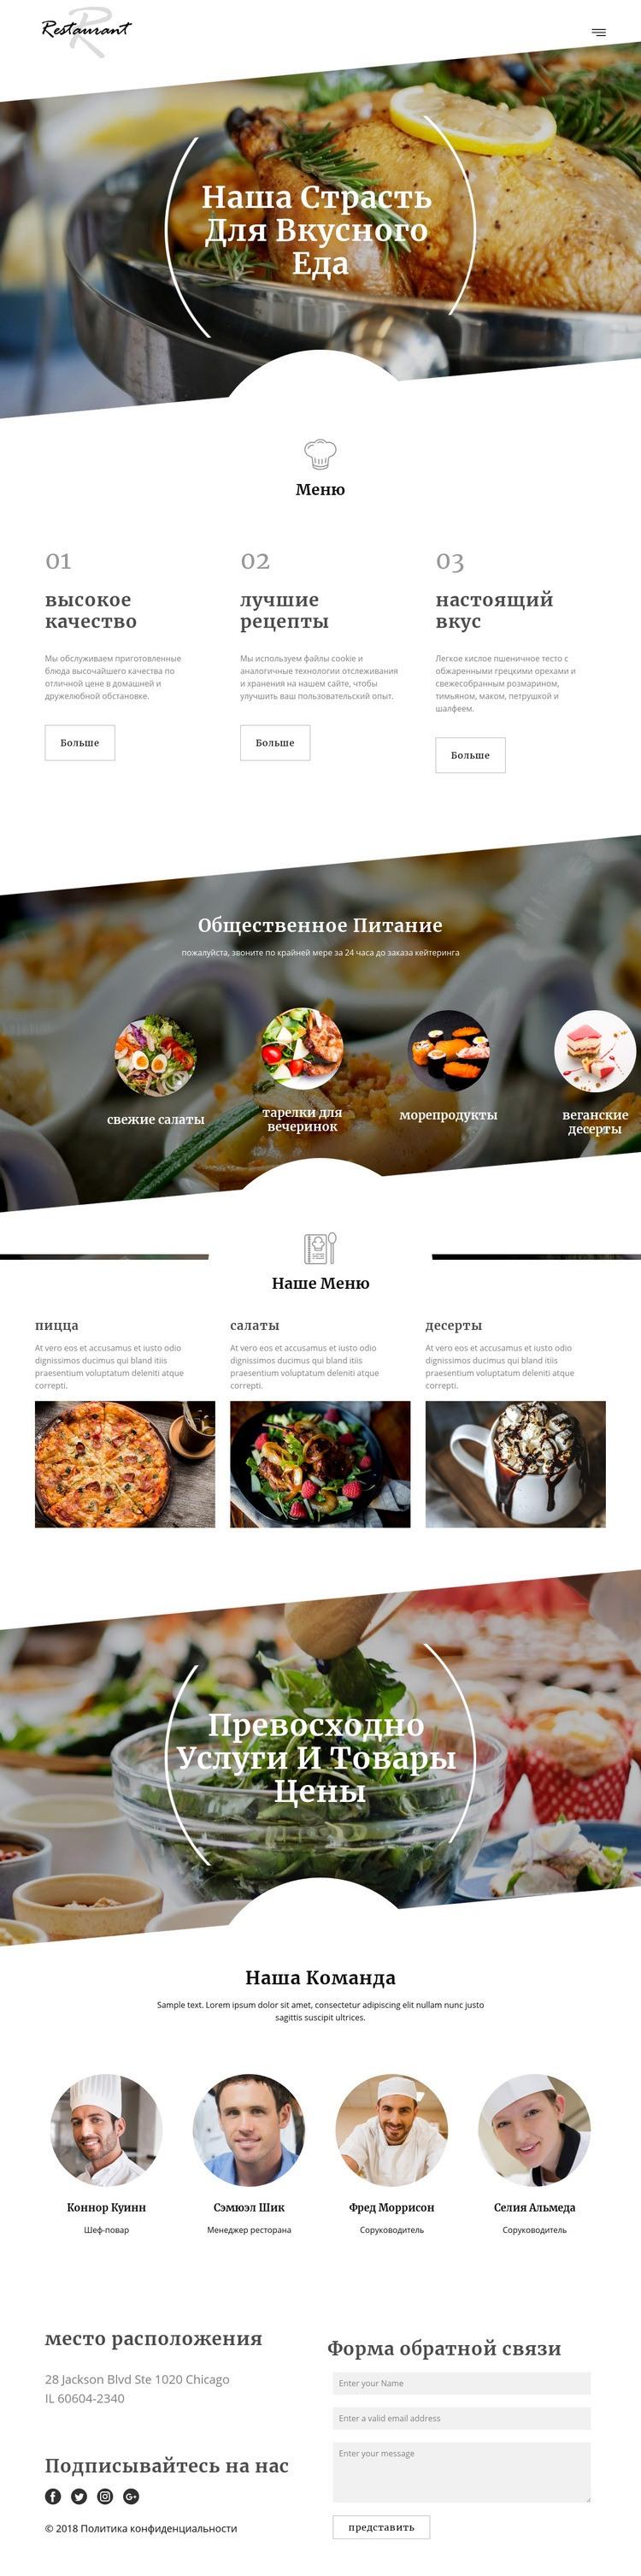 Рецепты от шеф-повара HTML шаблон